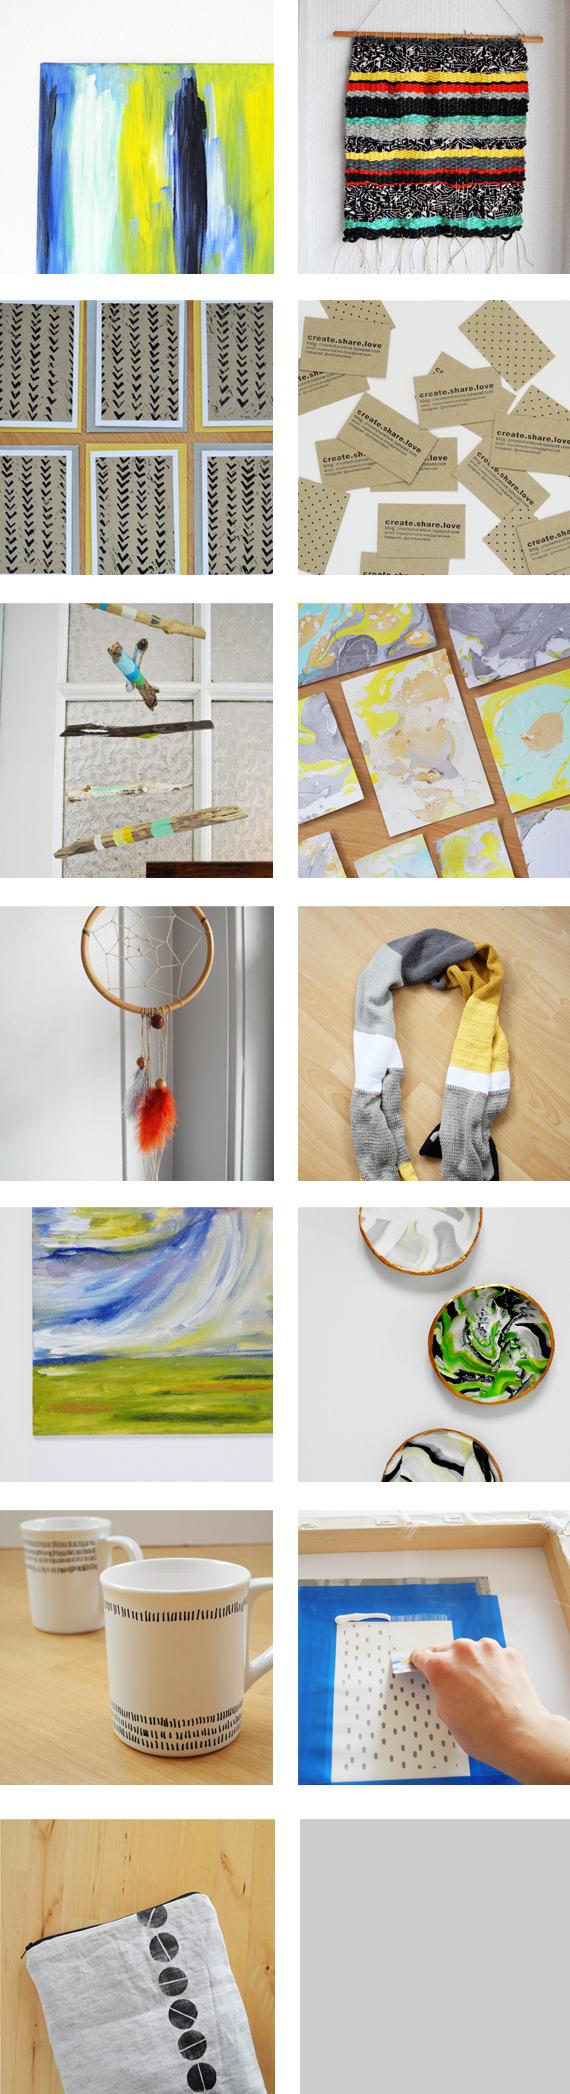 Create Share Love | 27 handmade items recap